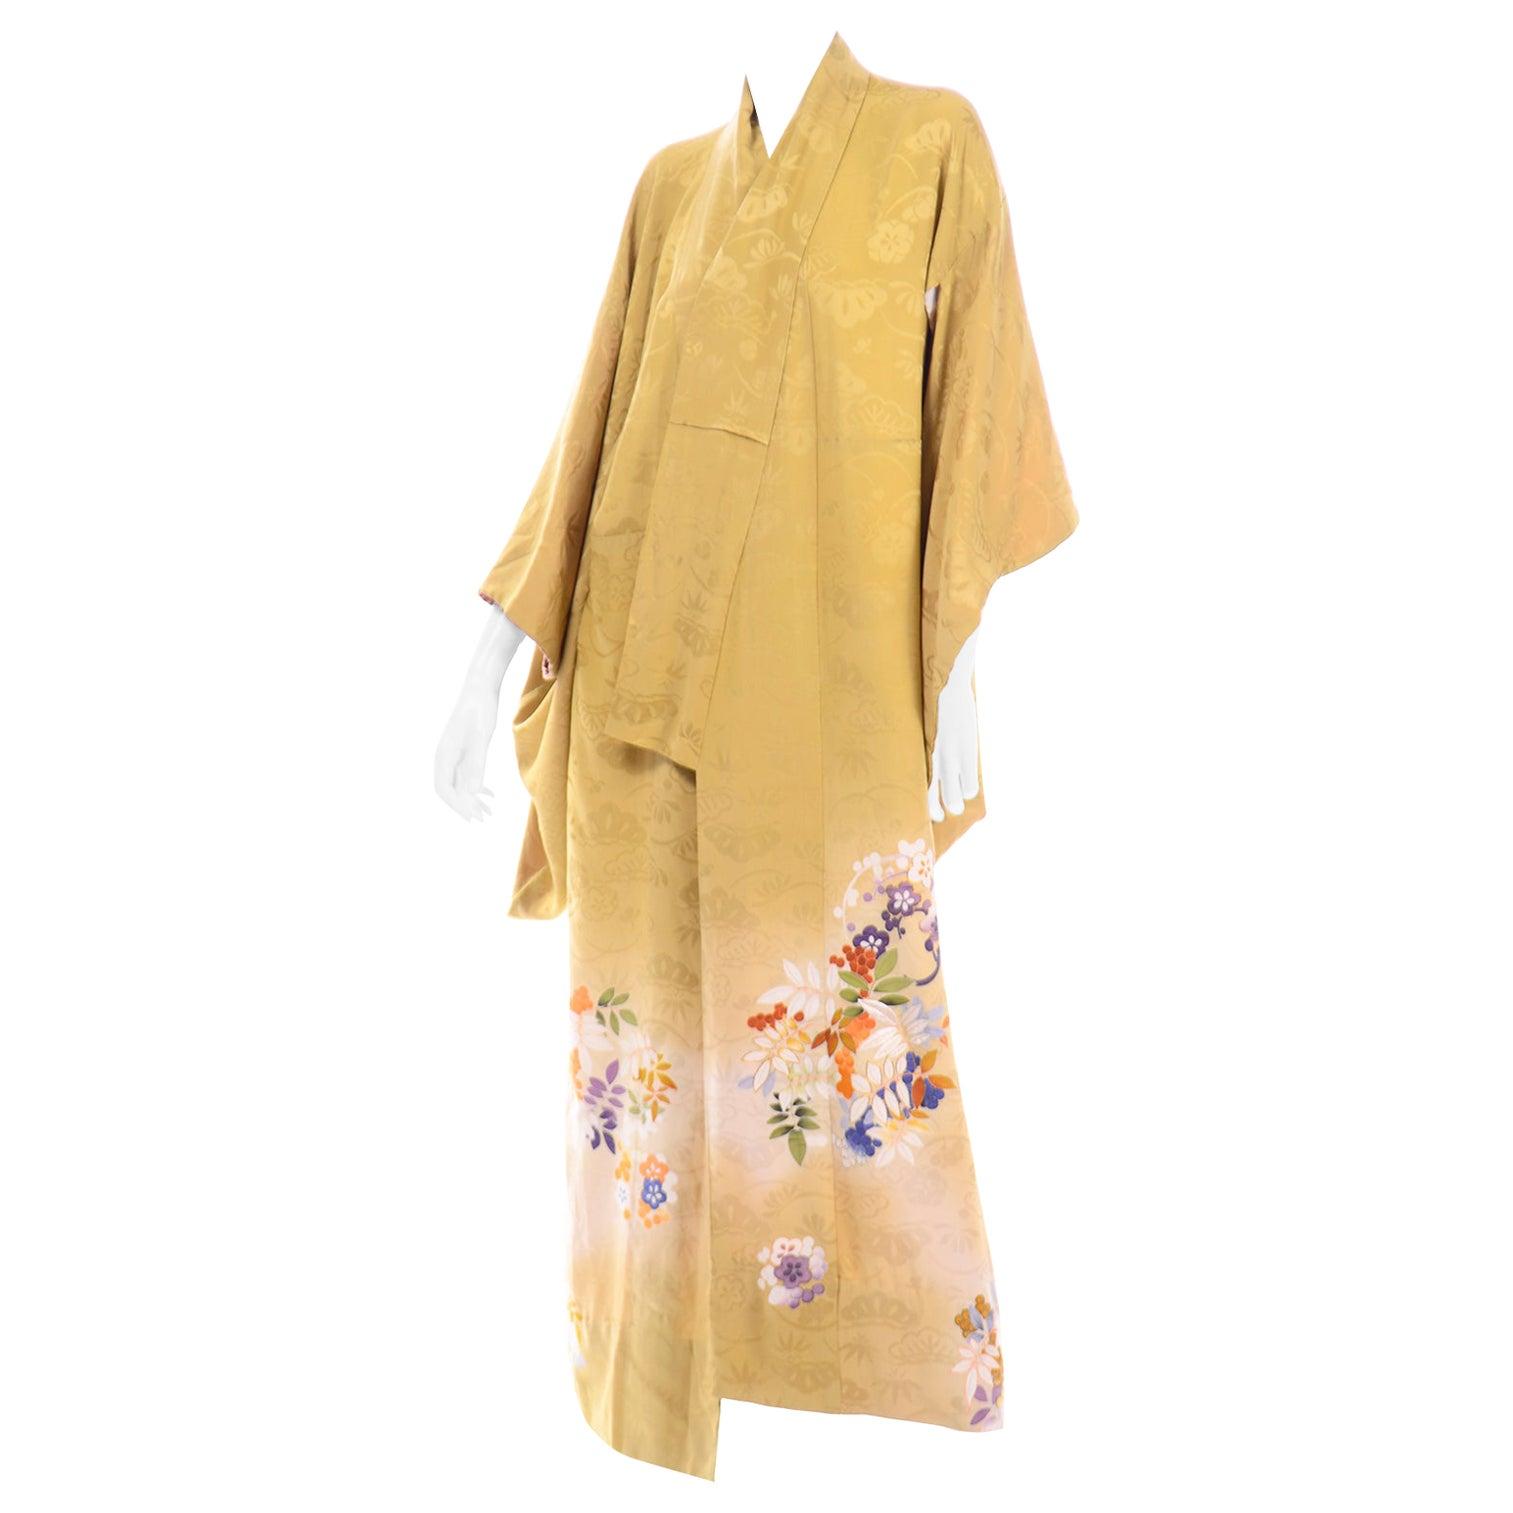 Vintage Marigold Yellow Silk Iro Tomesode Kimono Embroidered and Hand Painted